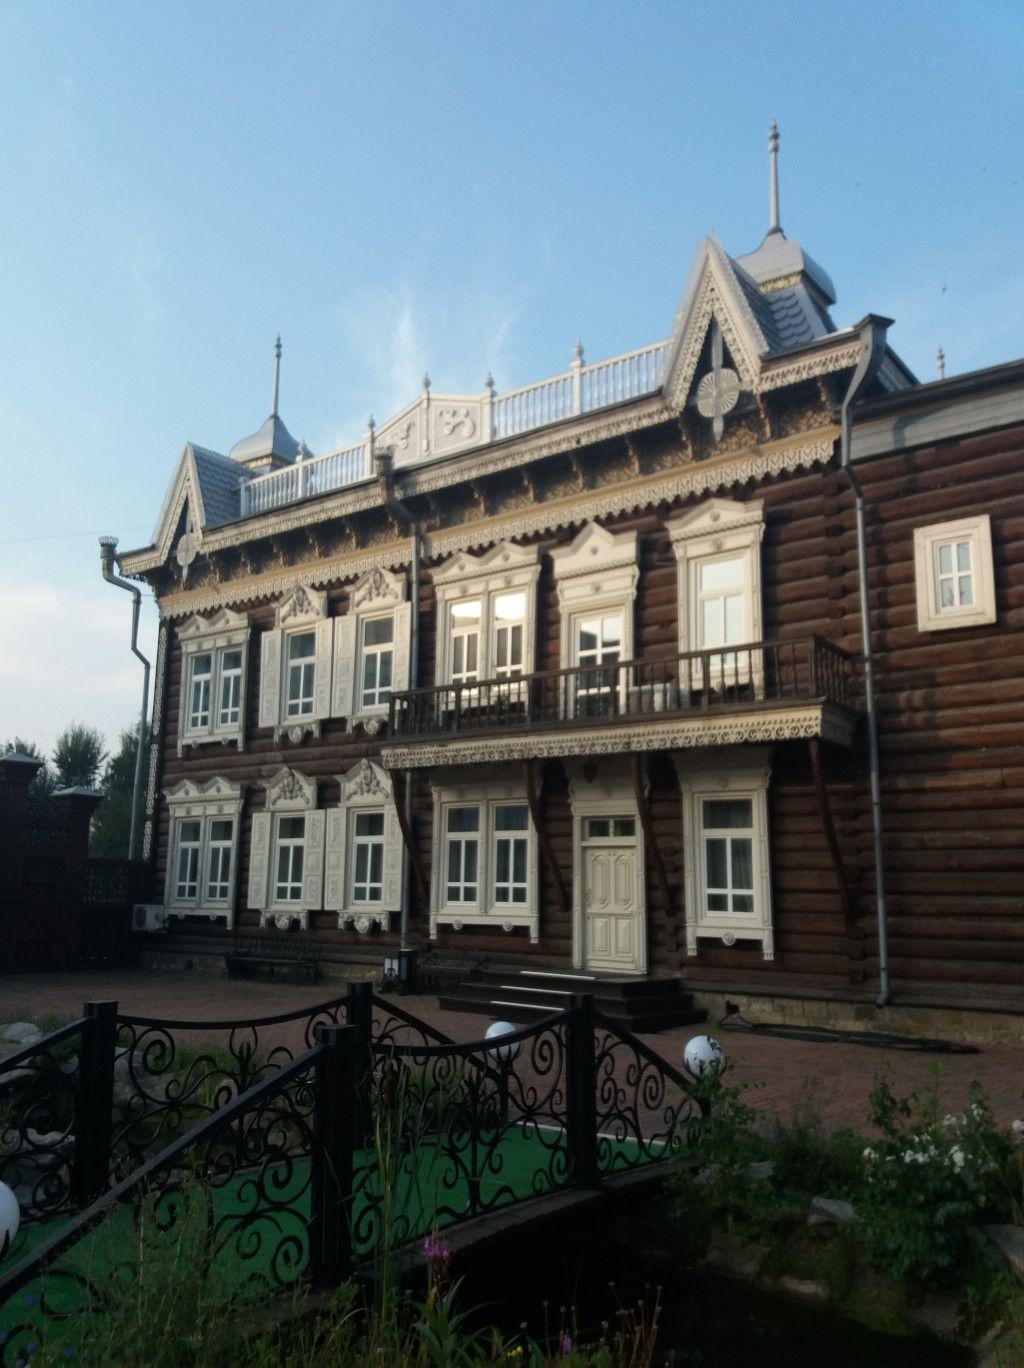 Europahaus Holzhaus in Irkutsk